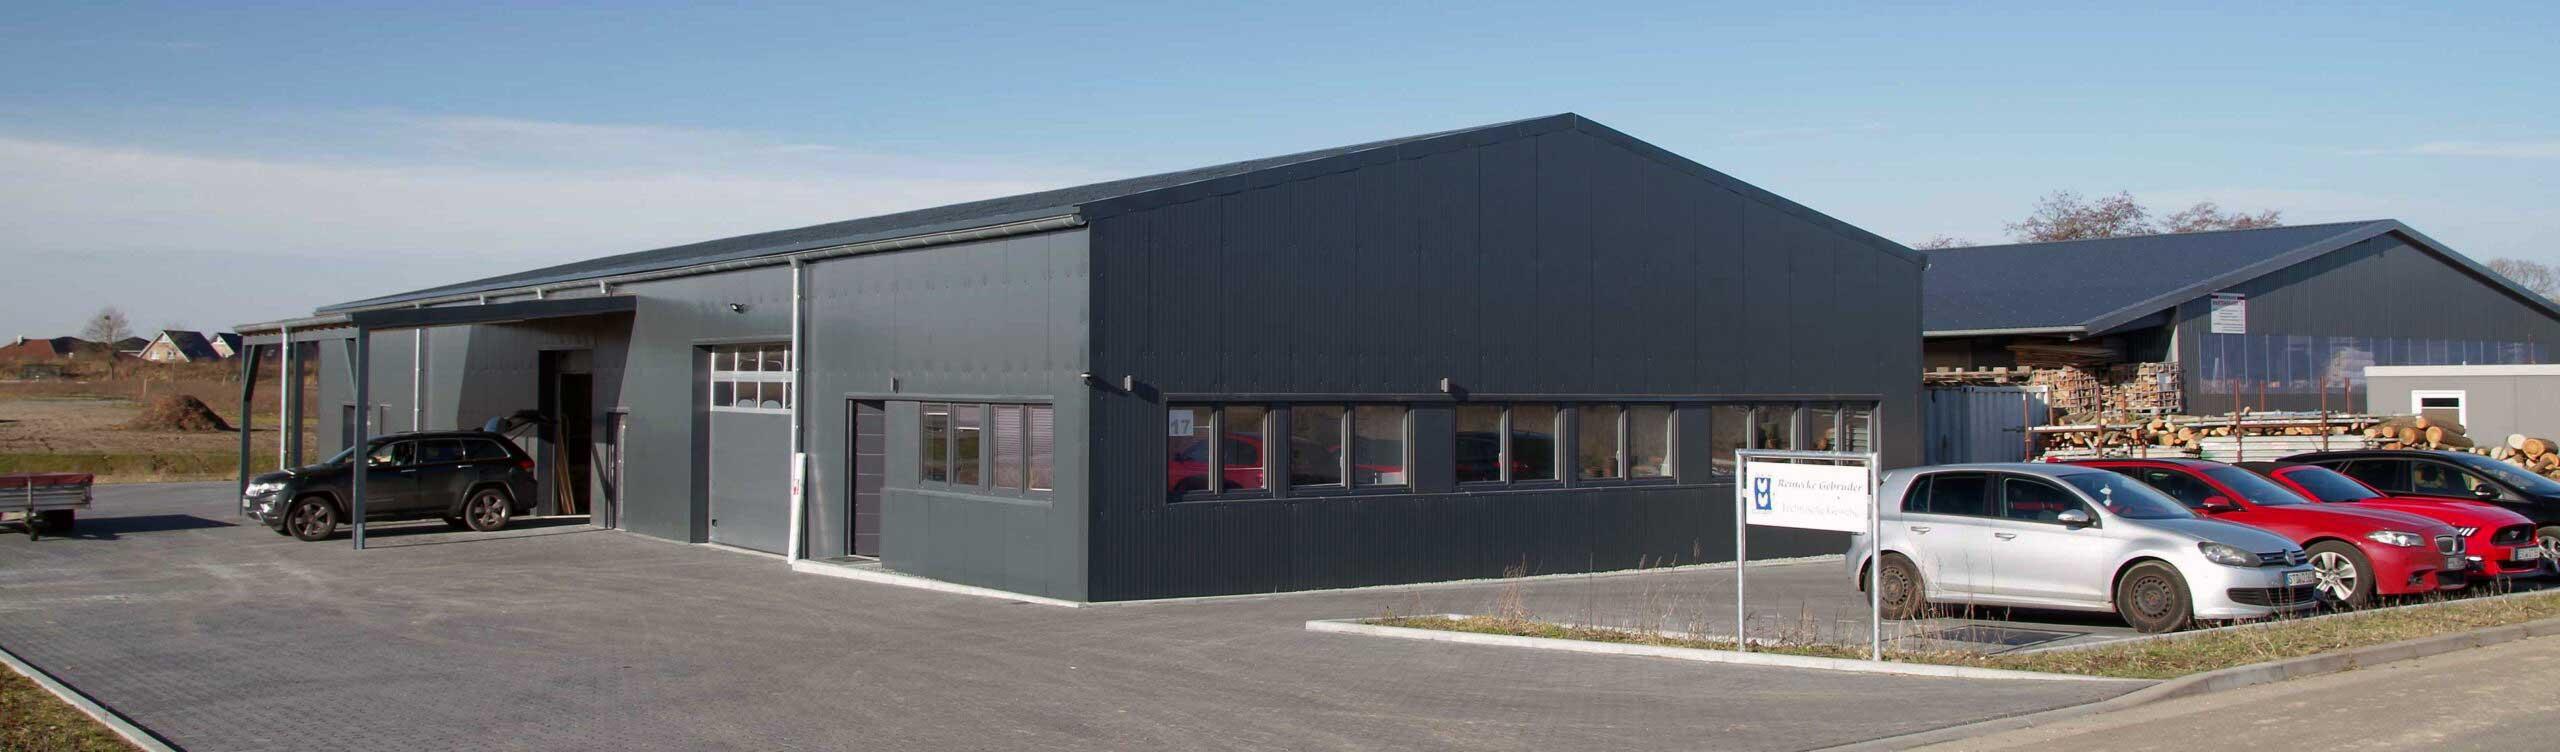 Firmensitz Gebrüder Reinecke in Harsefeld